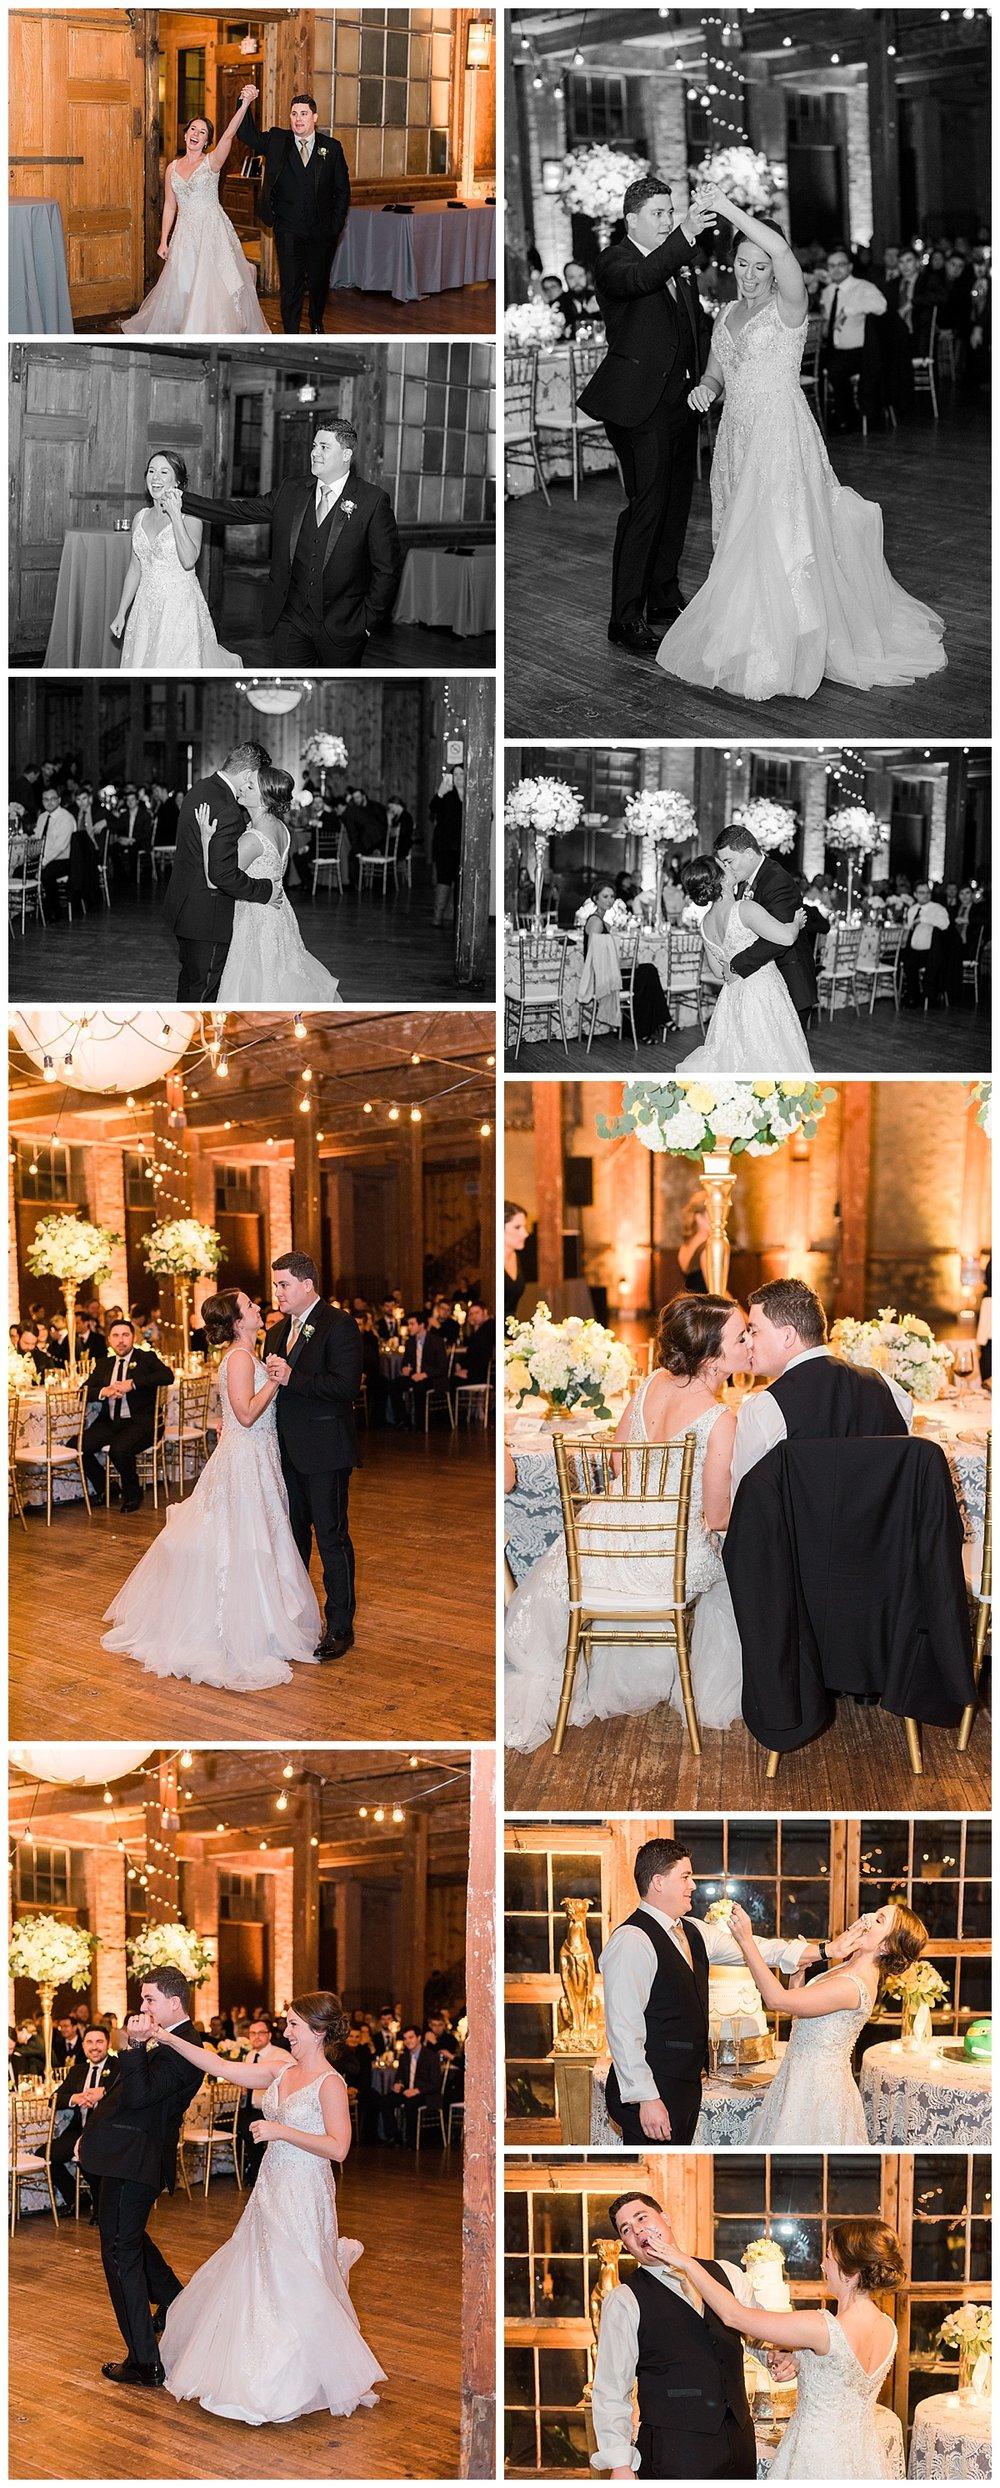 the-cotton-mill-wedding-ar-photography-18.jpg